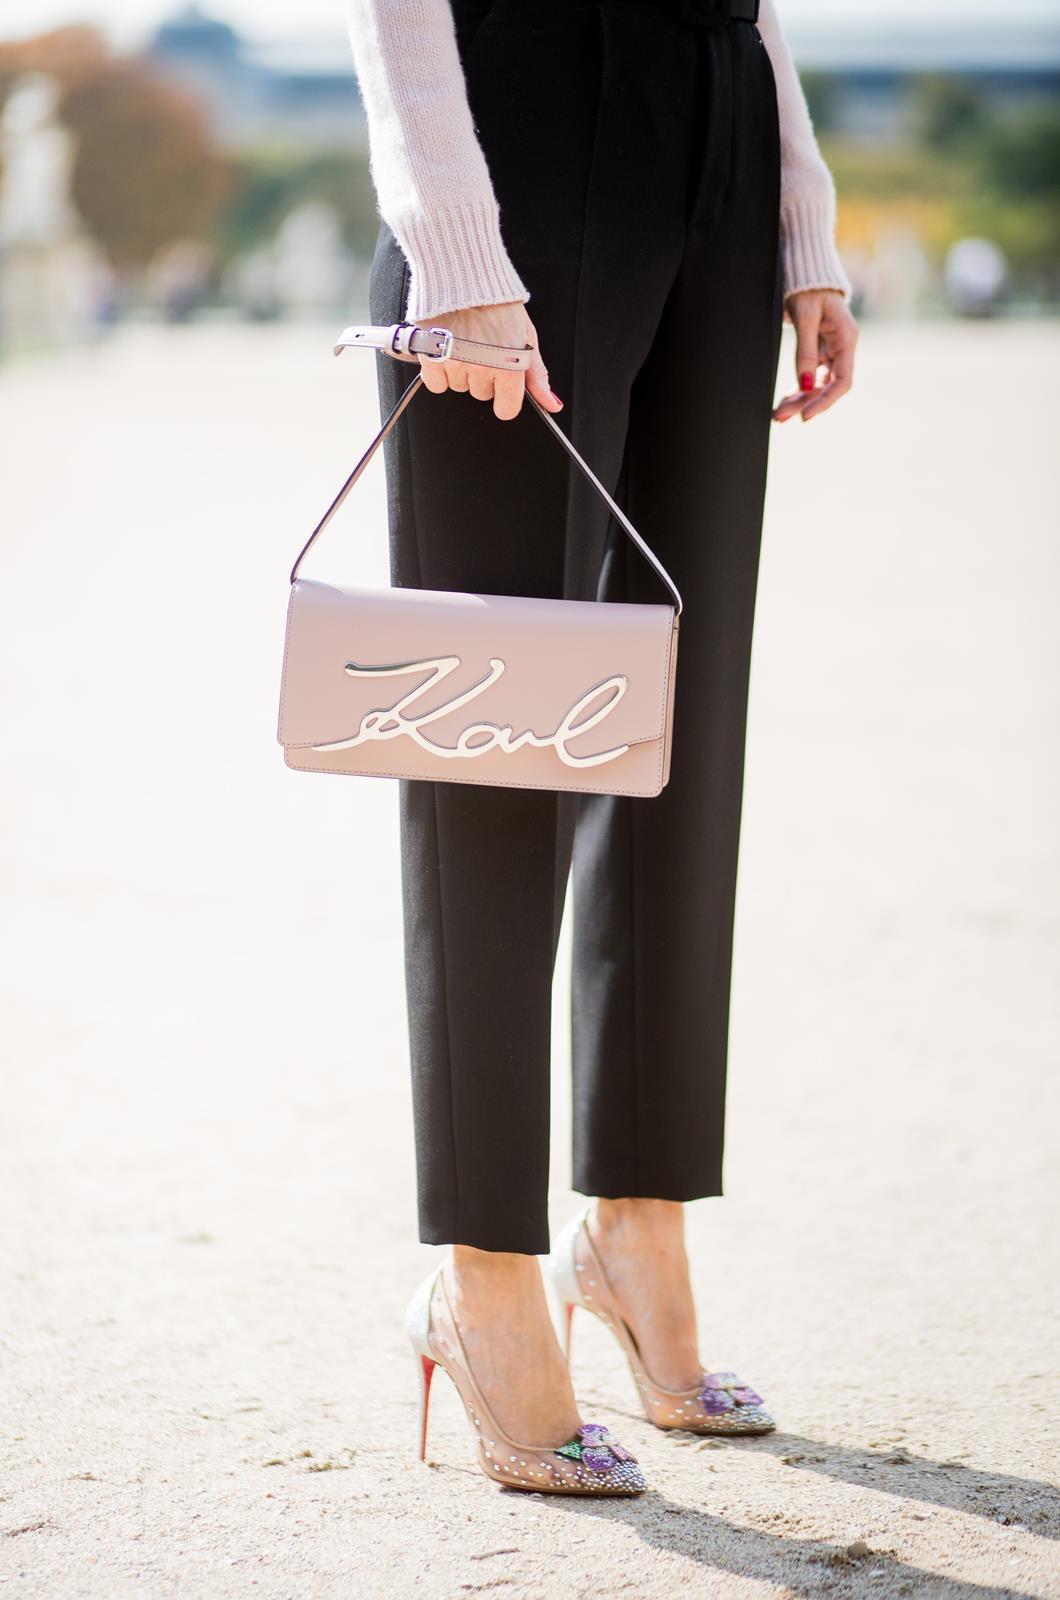 Karl Lagerfeld Bag Paris Blog Alexandra Lapp